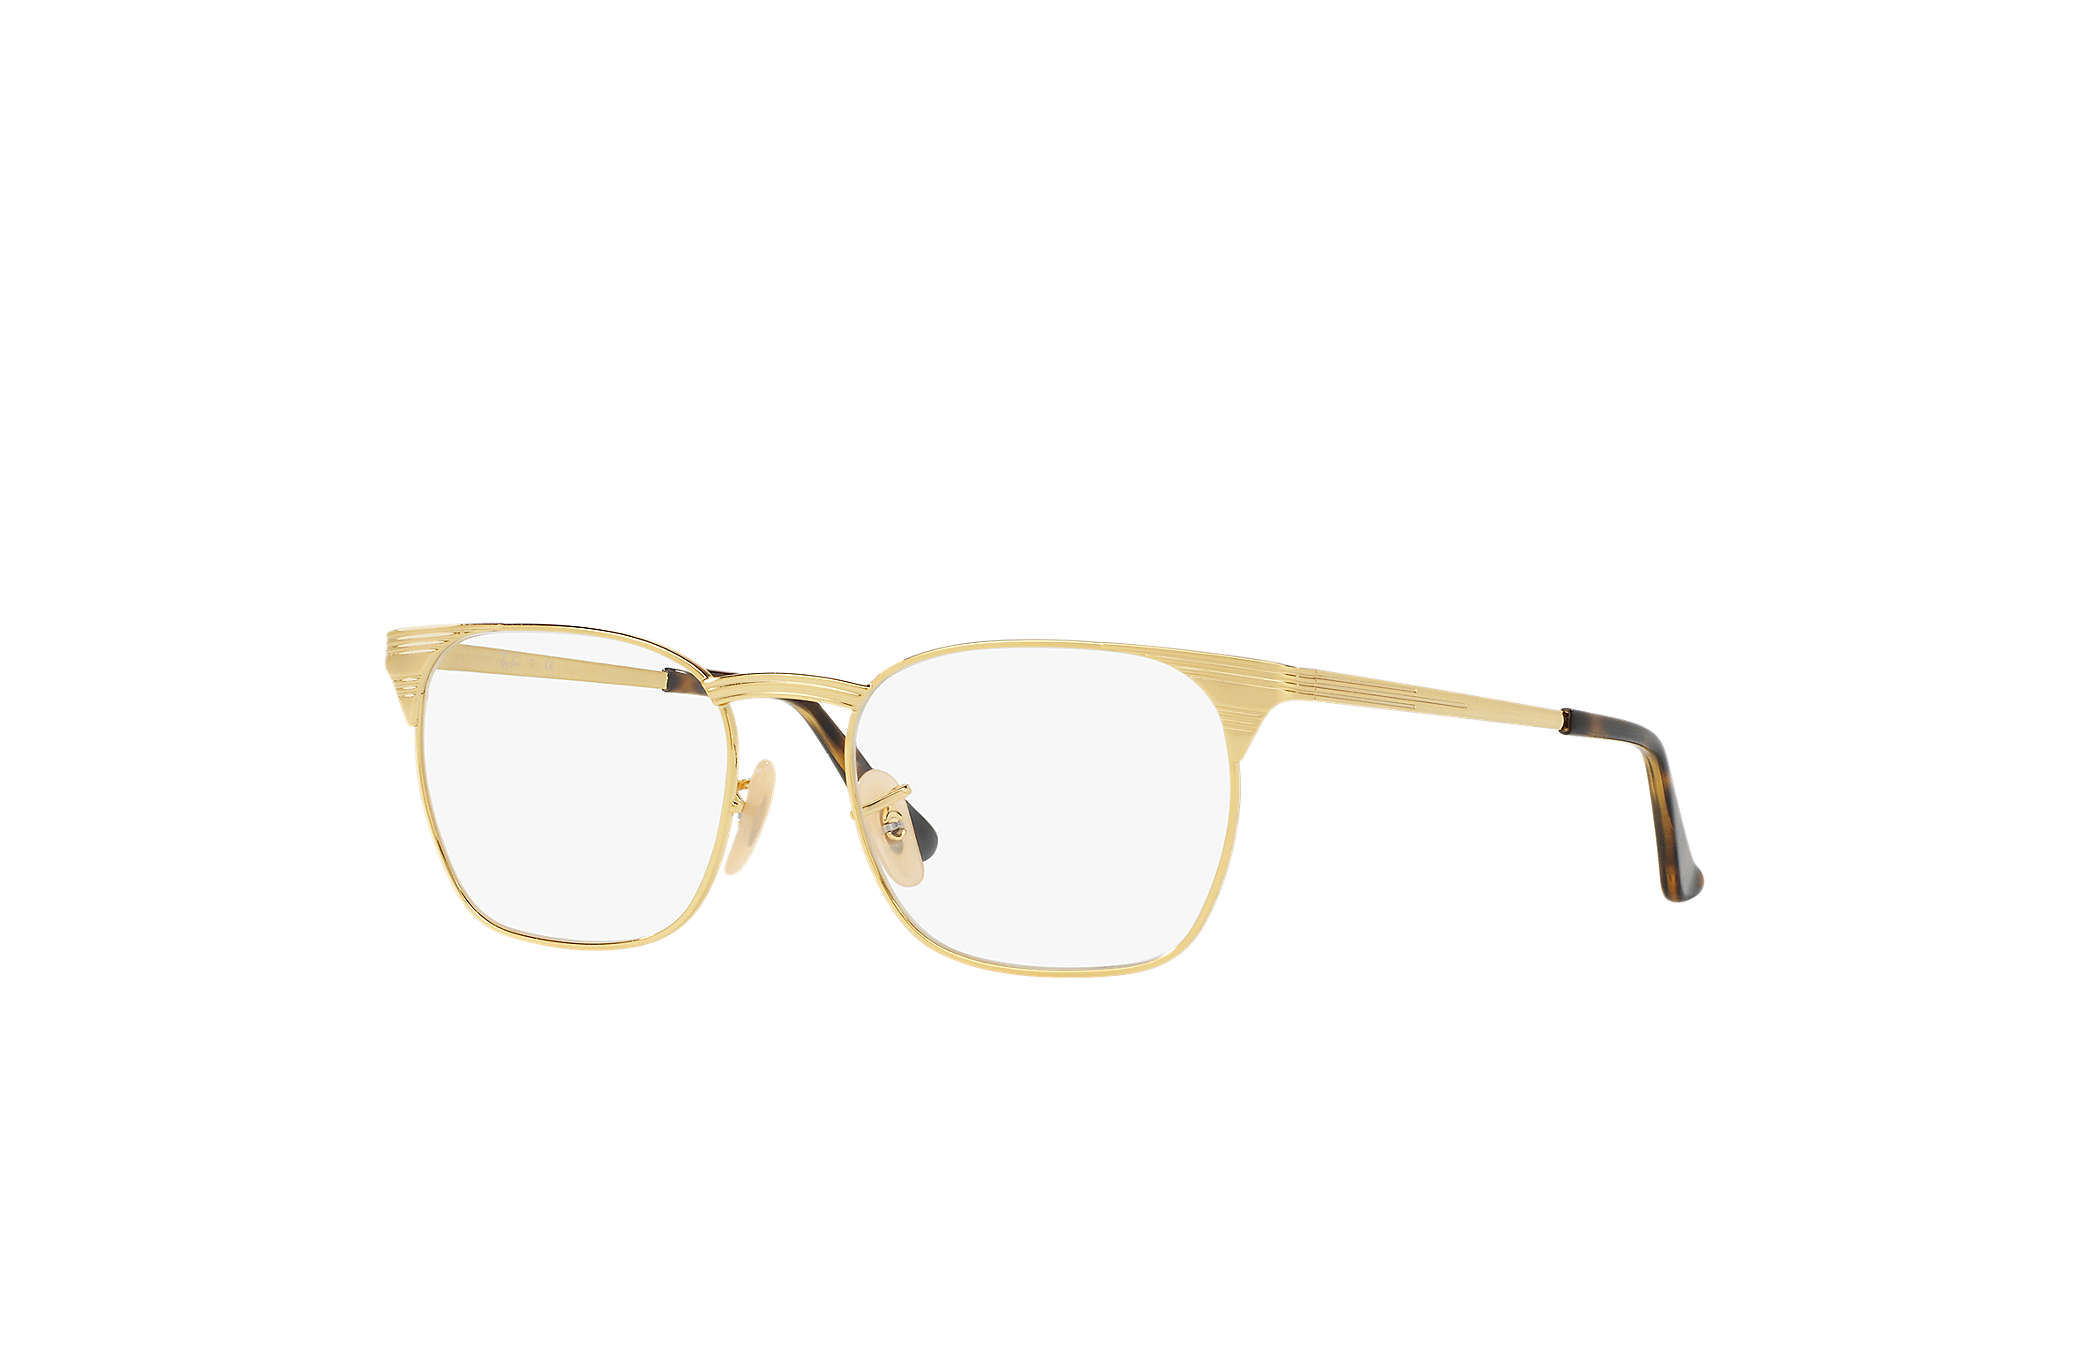 ec8fa82597c5f Ray-Ban eyeglasses Signet Optics RB6386 Gold - Metal - 0RX6386250053 ...